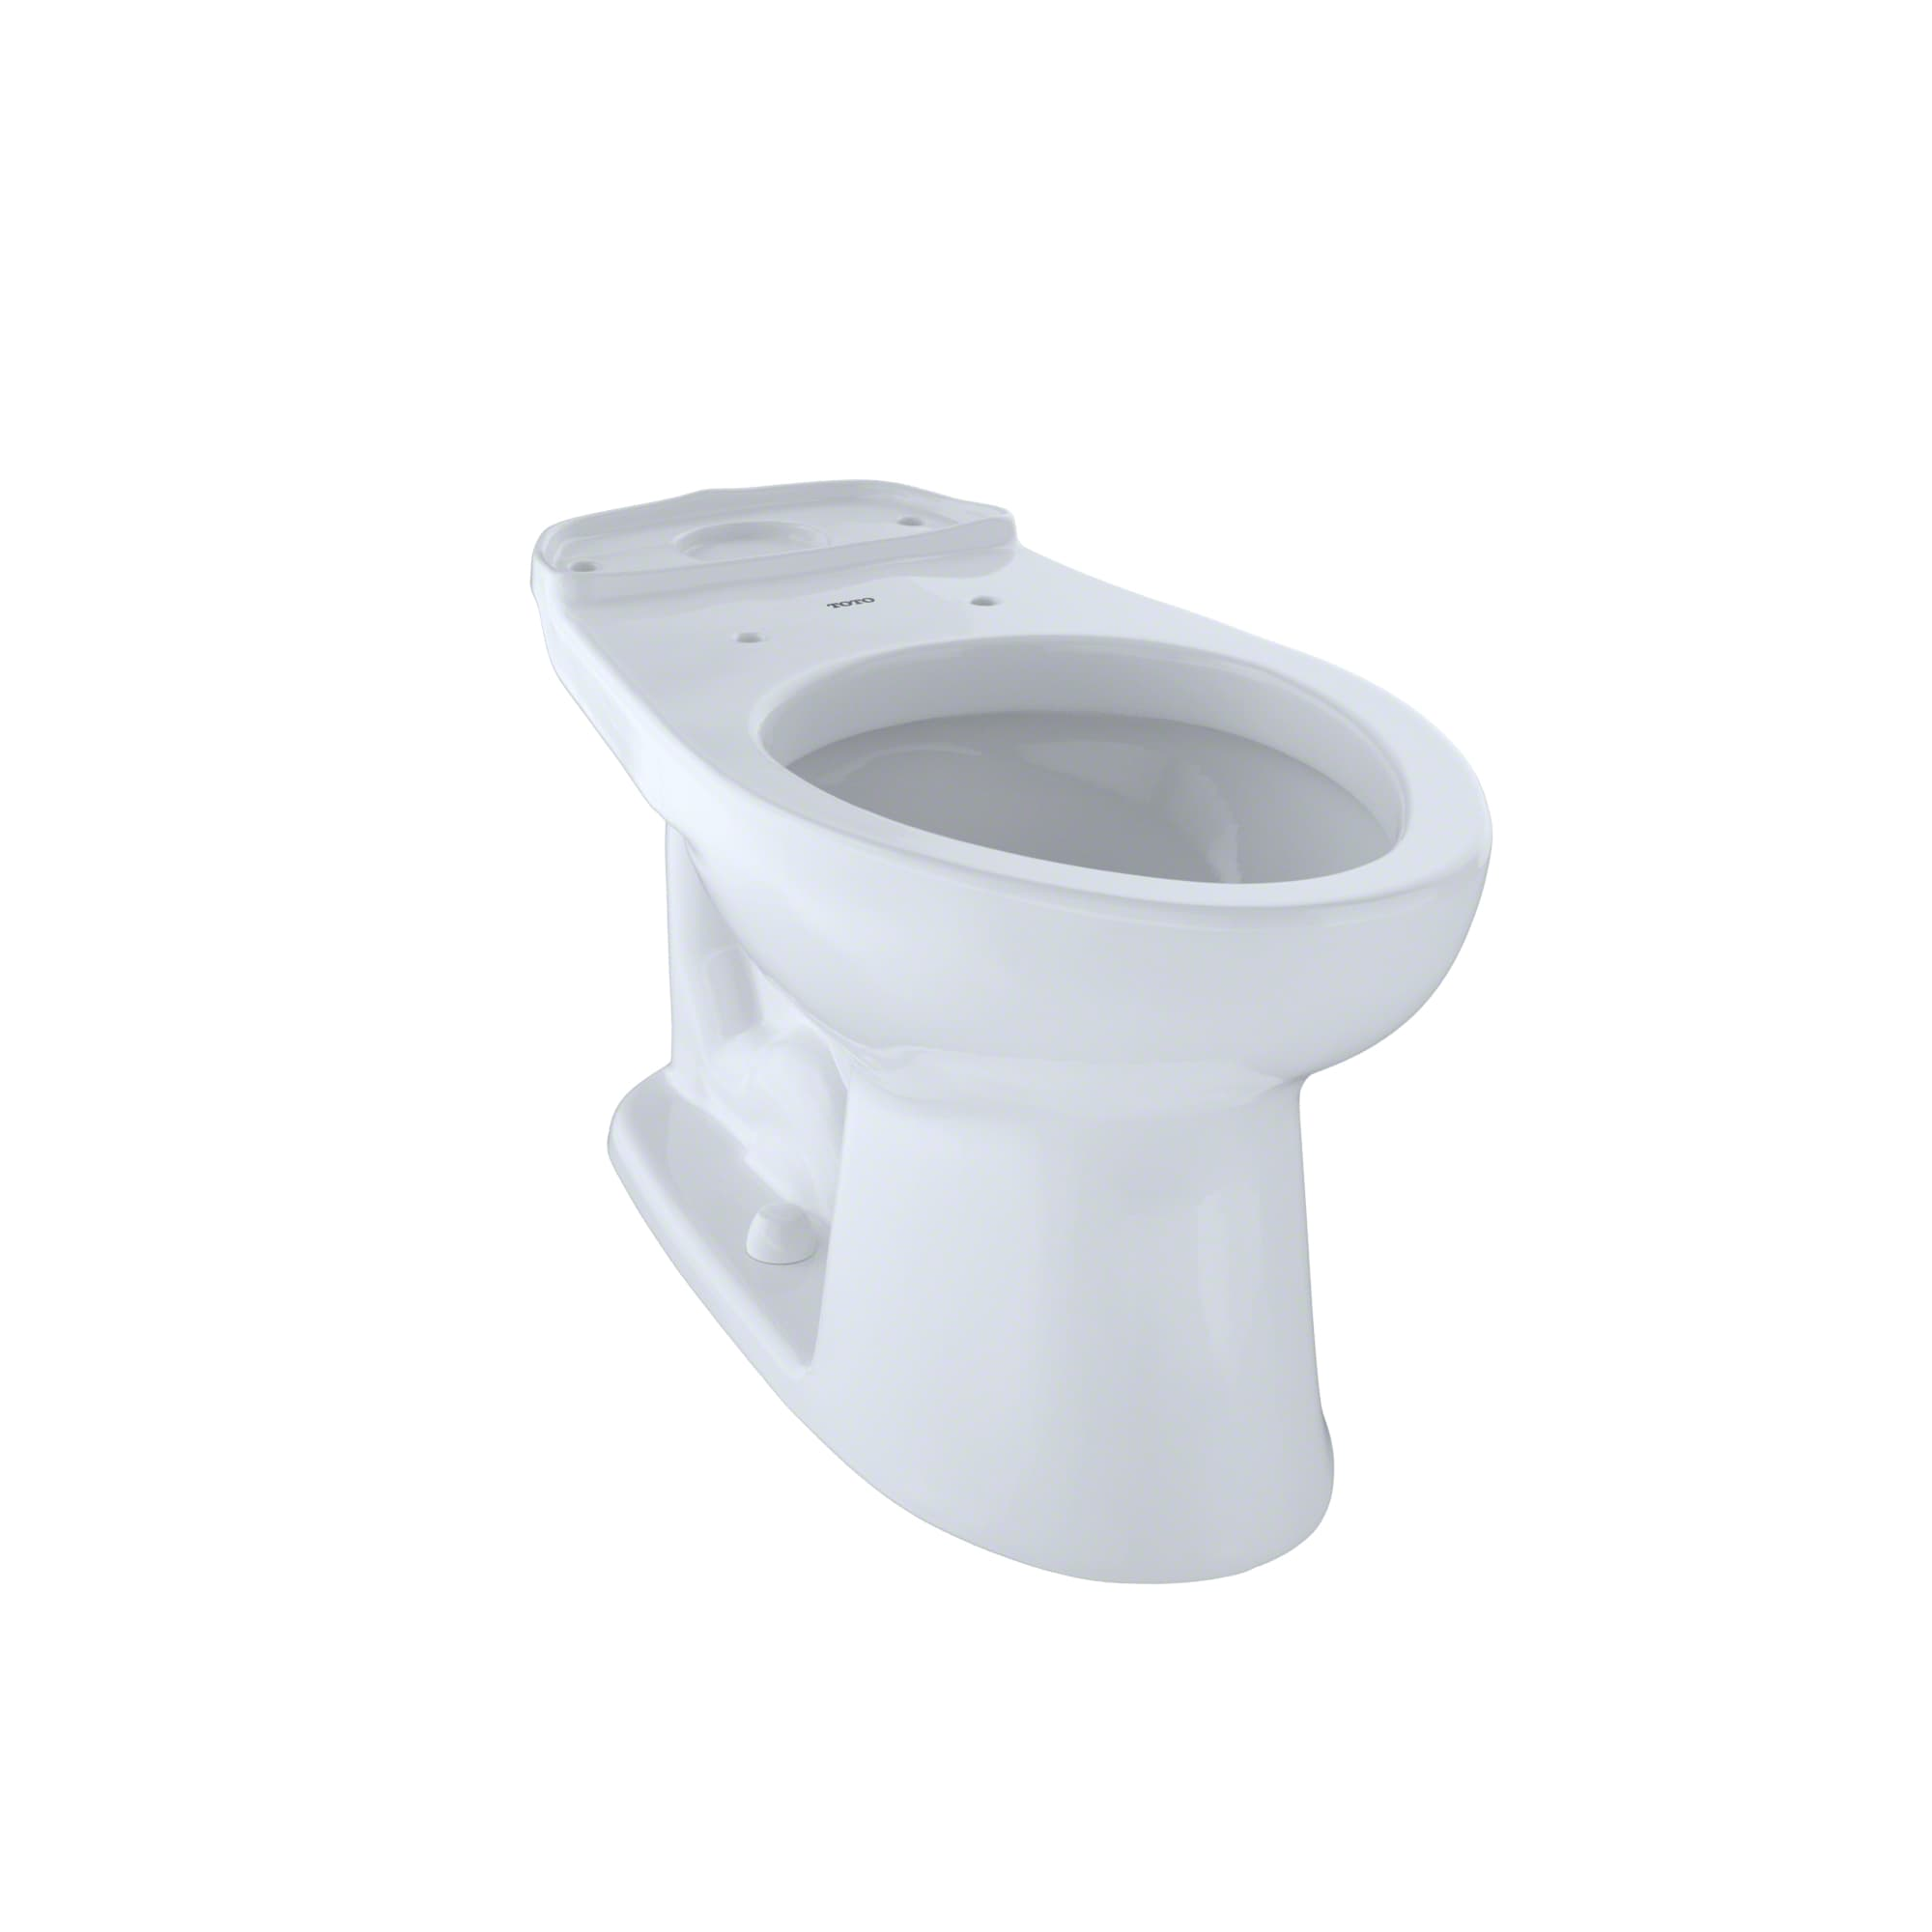 Toto Elongated Toilet Seat.Toto C744ef 10